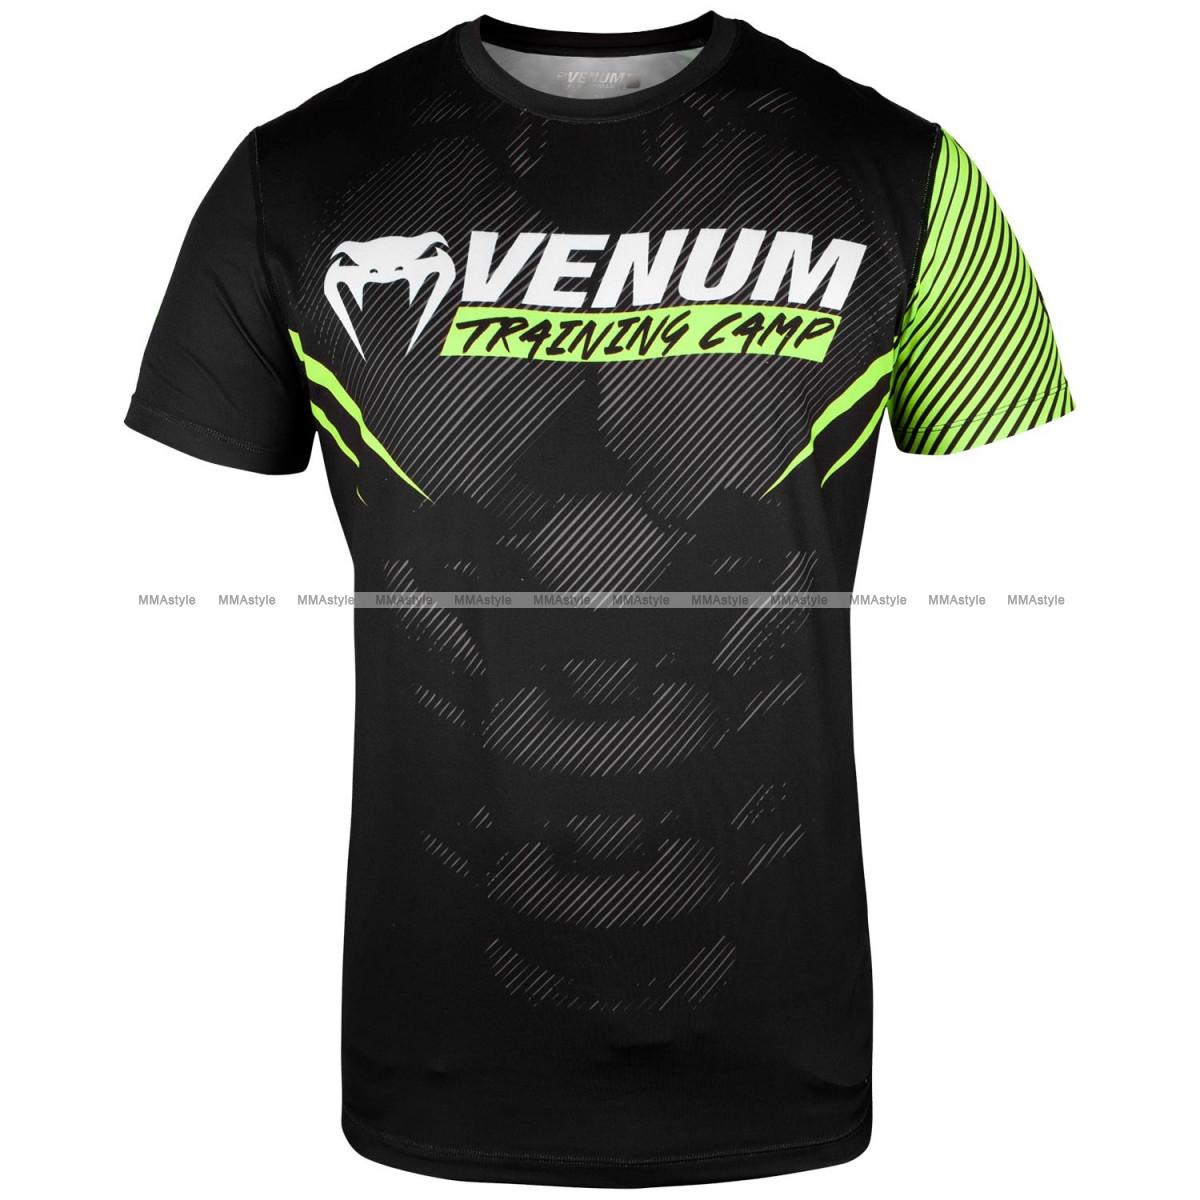 Футболка Venum Training Camp 2.0 T-shirt Black Neo Yellow